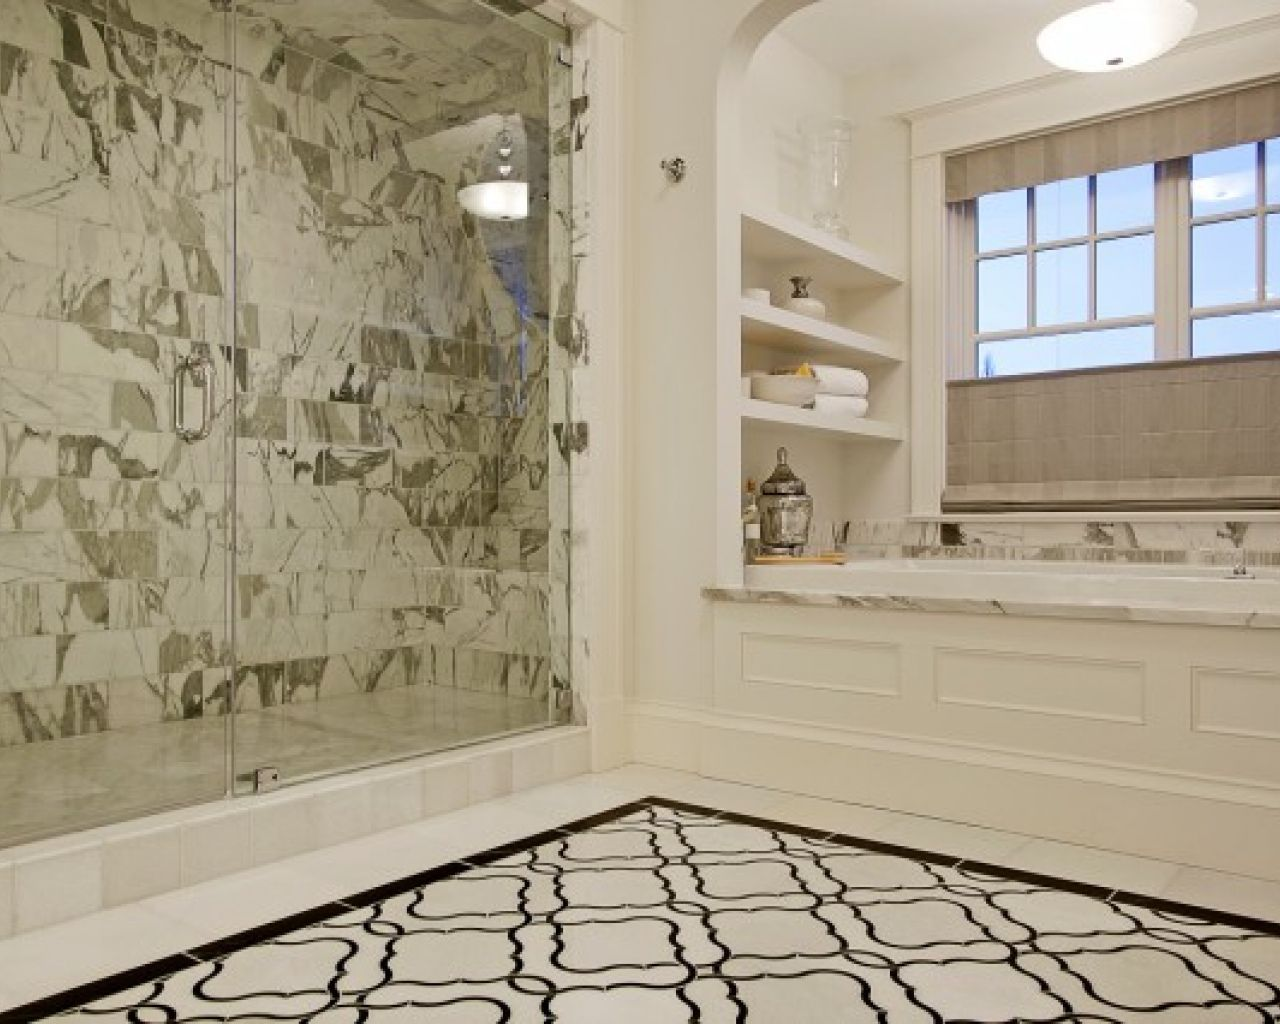 Basketweave tile bathroom pictures - Best Images About Bathroom Flooring Ideas On Pinterest Marble Bathroom Ideas